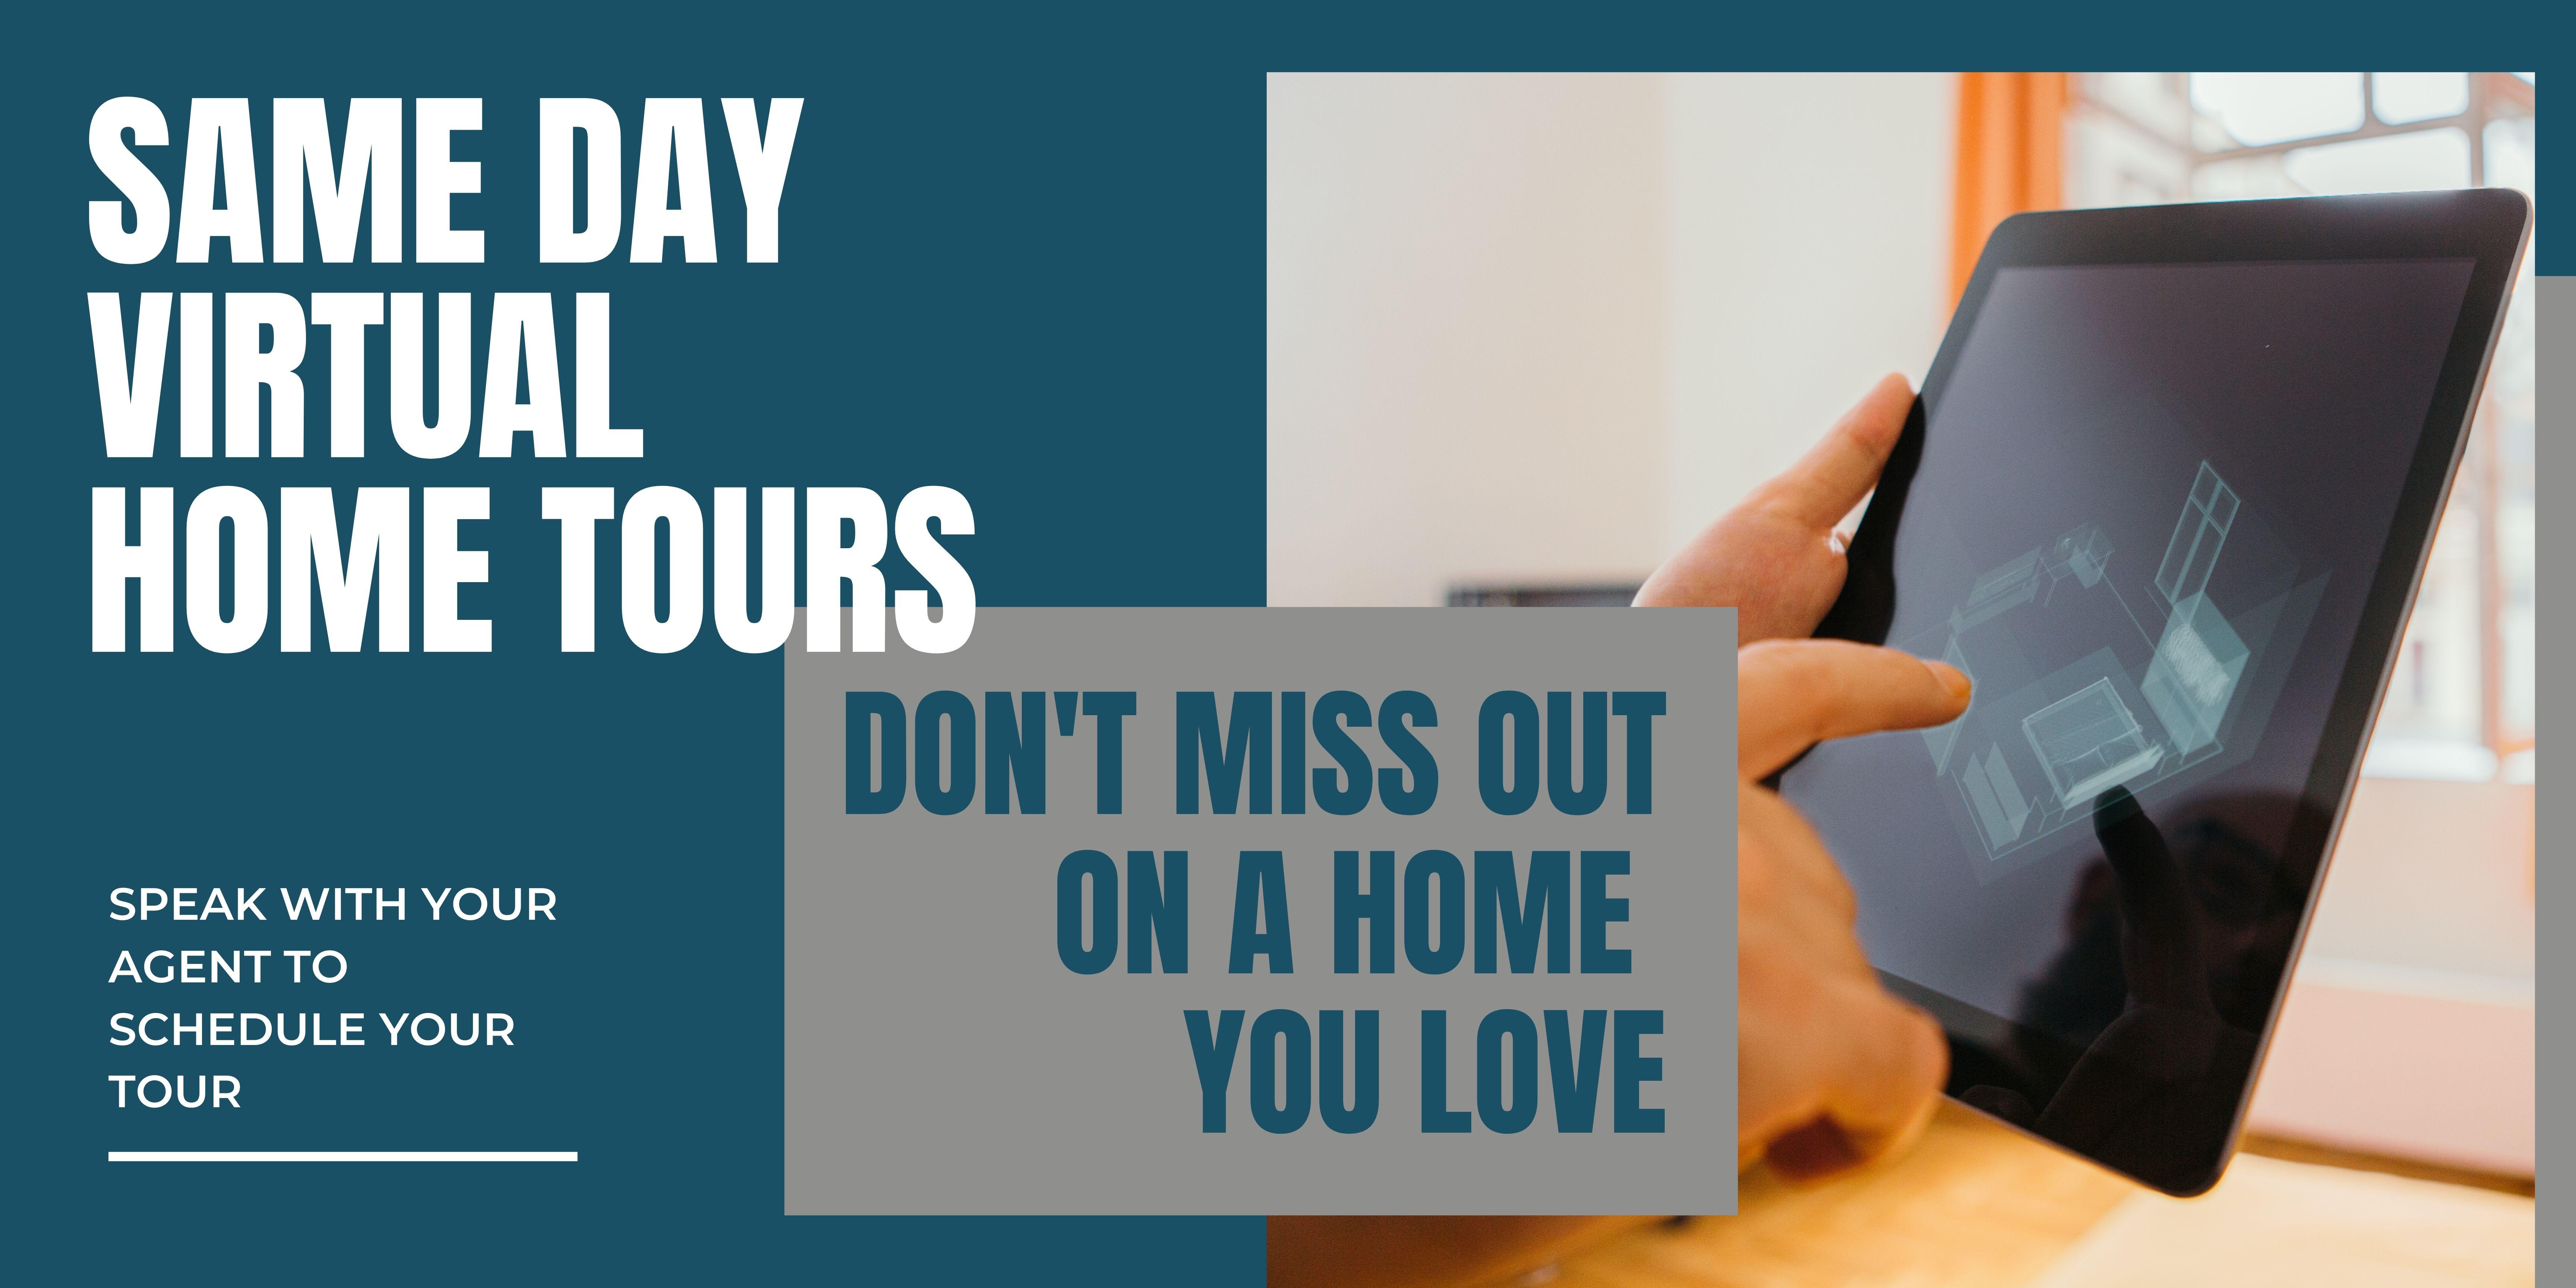 Same Day Virtual Home Tours